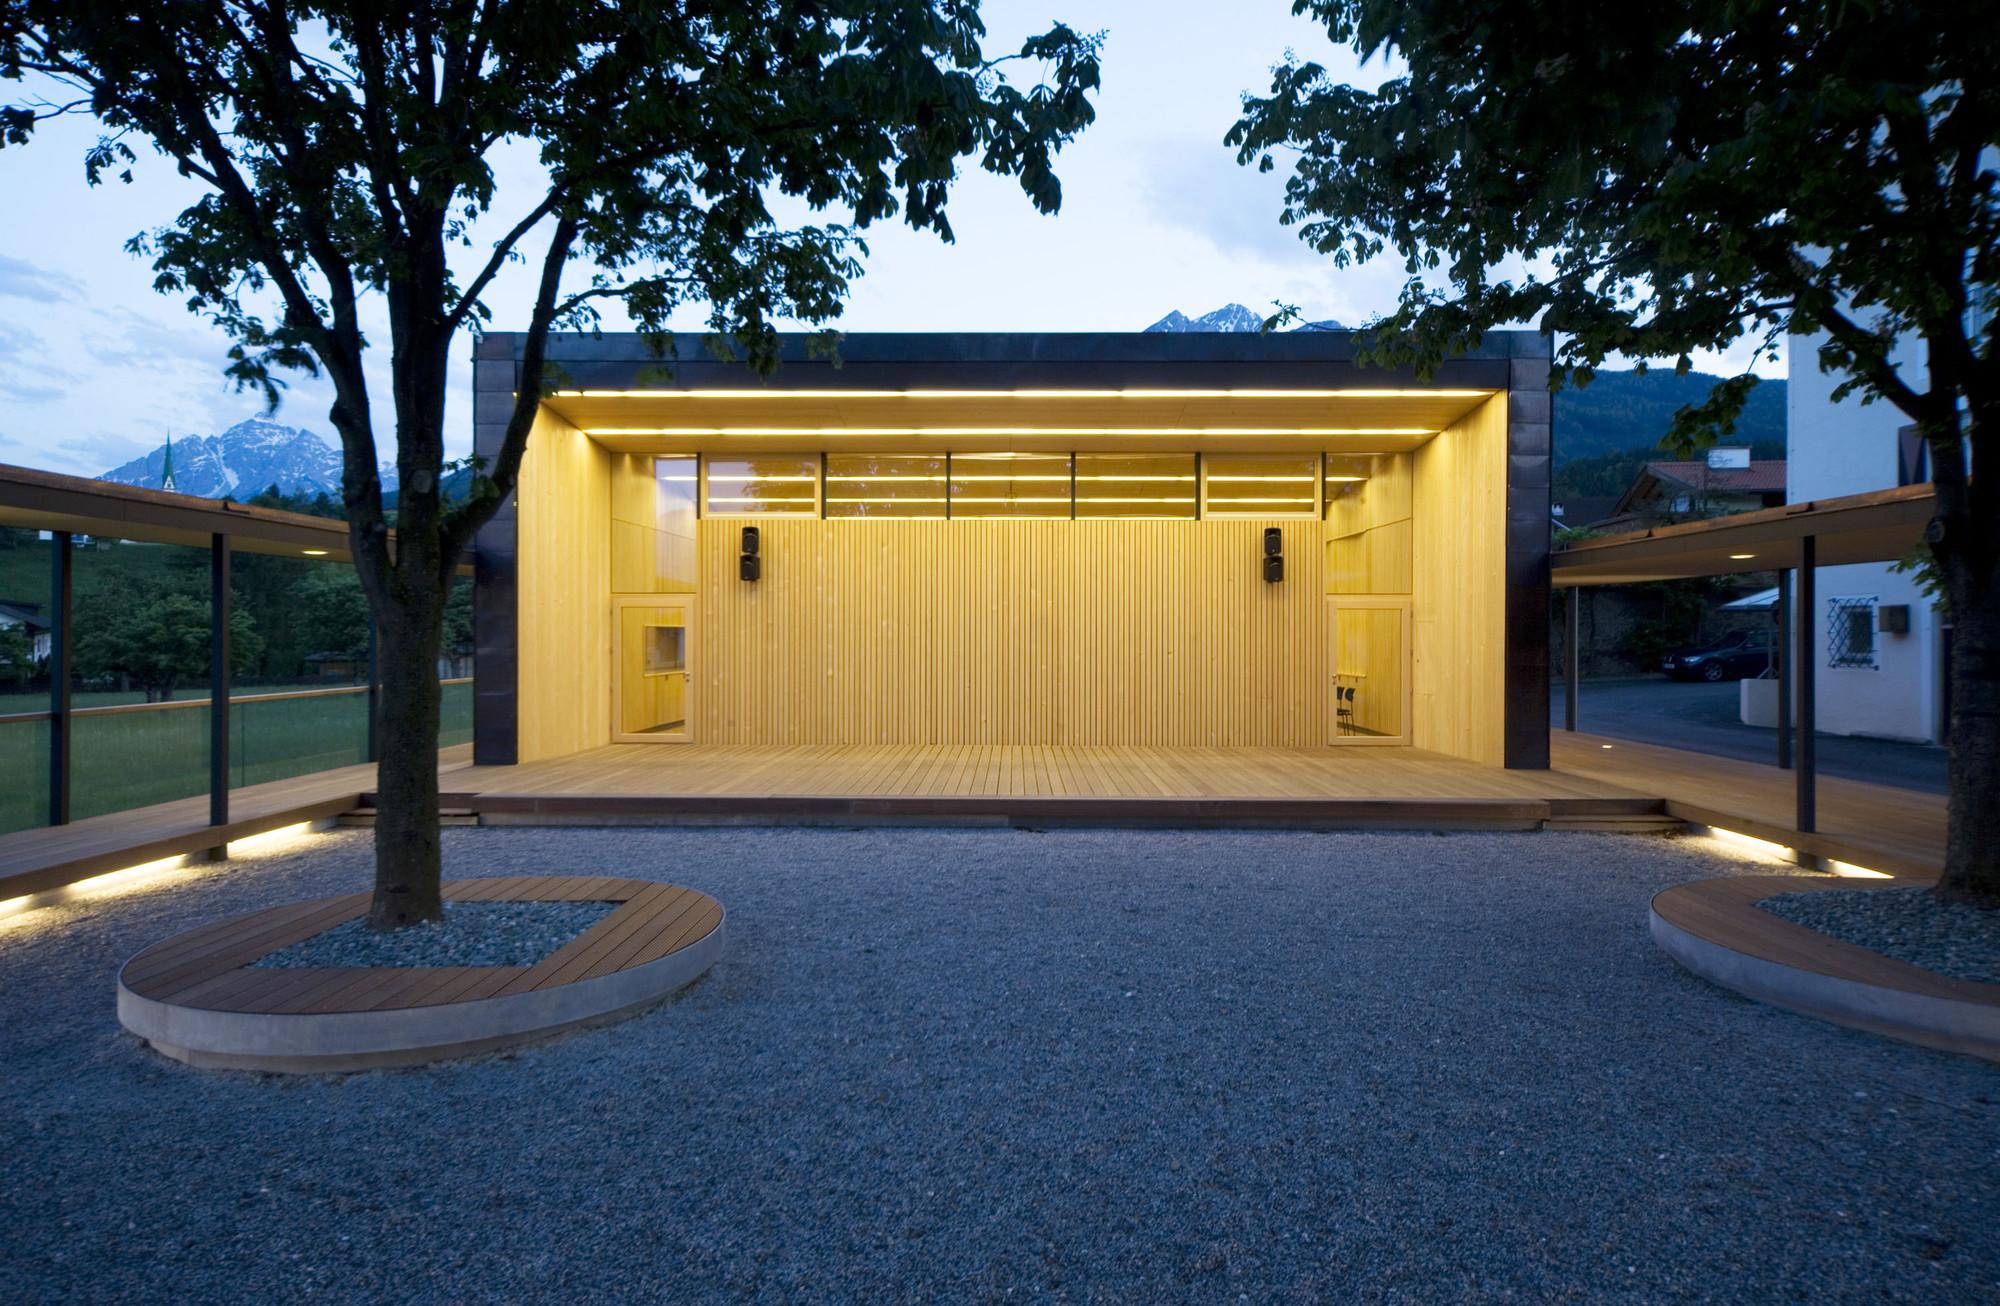 Galer a de musikprobelokal sch tzenheim natters for Architektur werkstatt